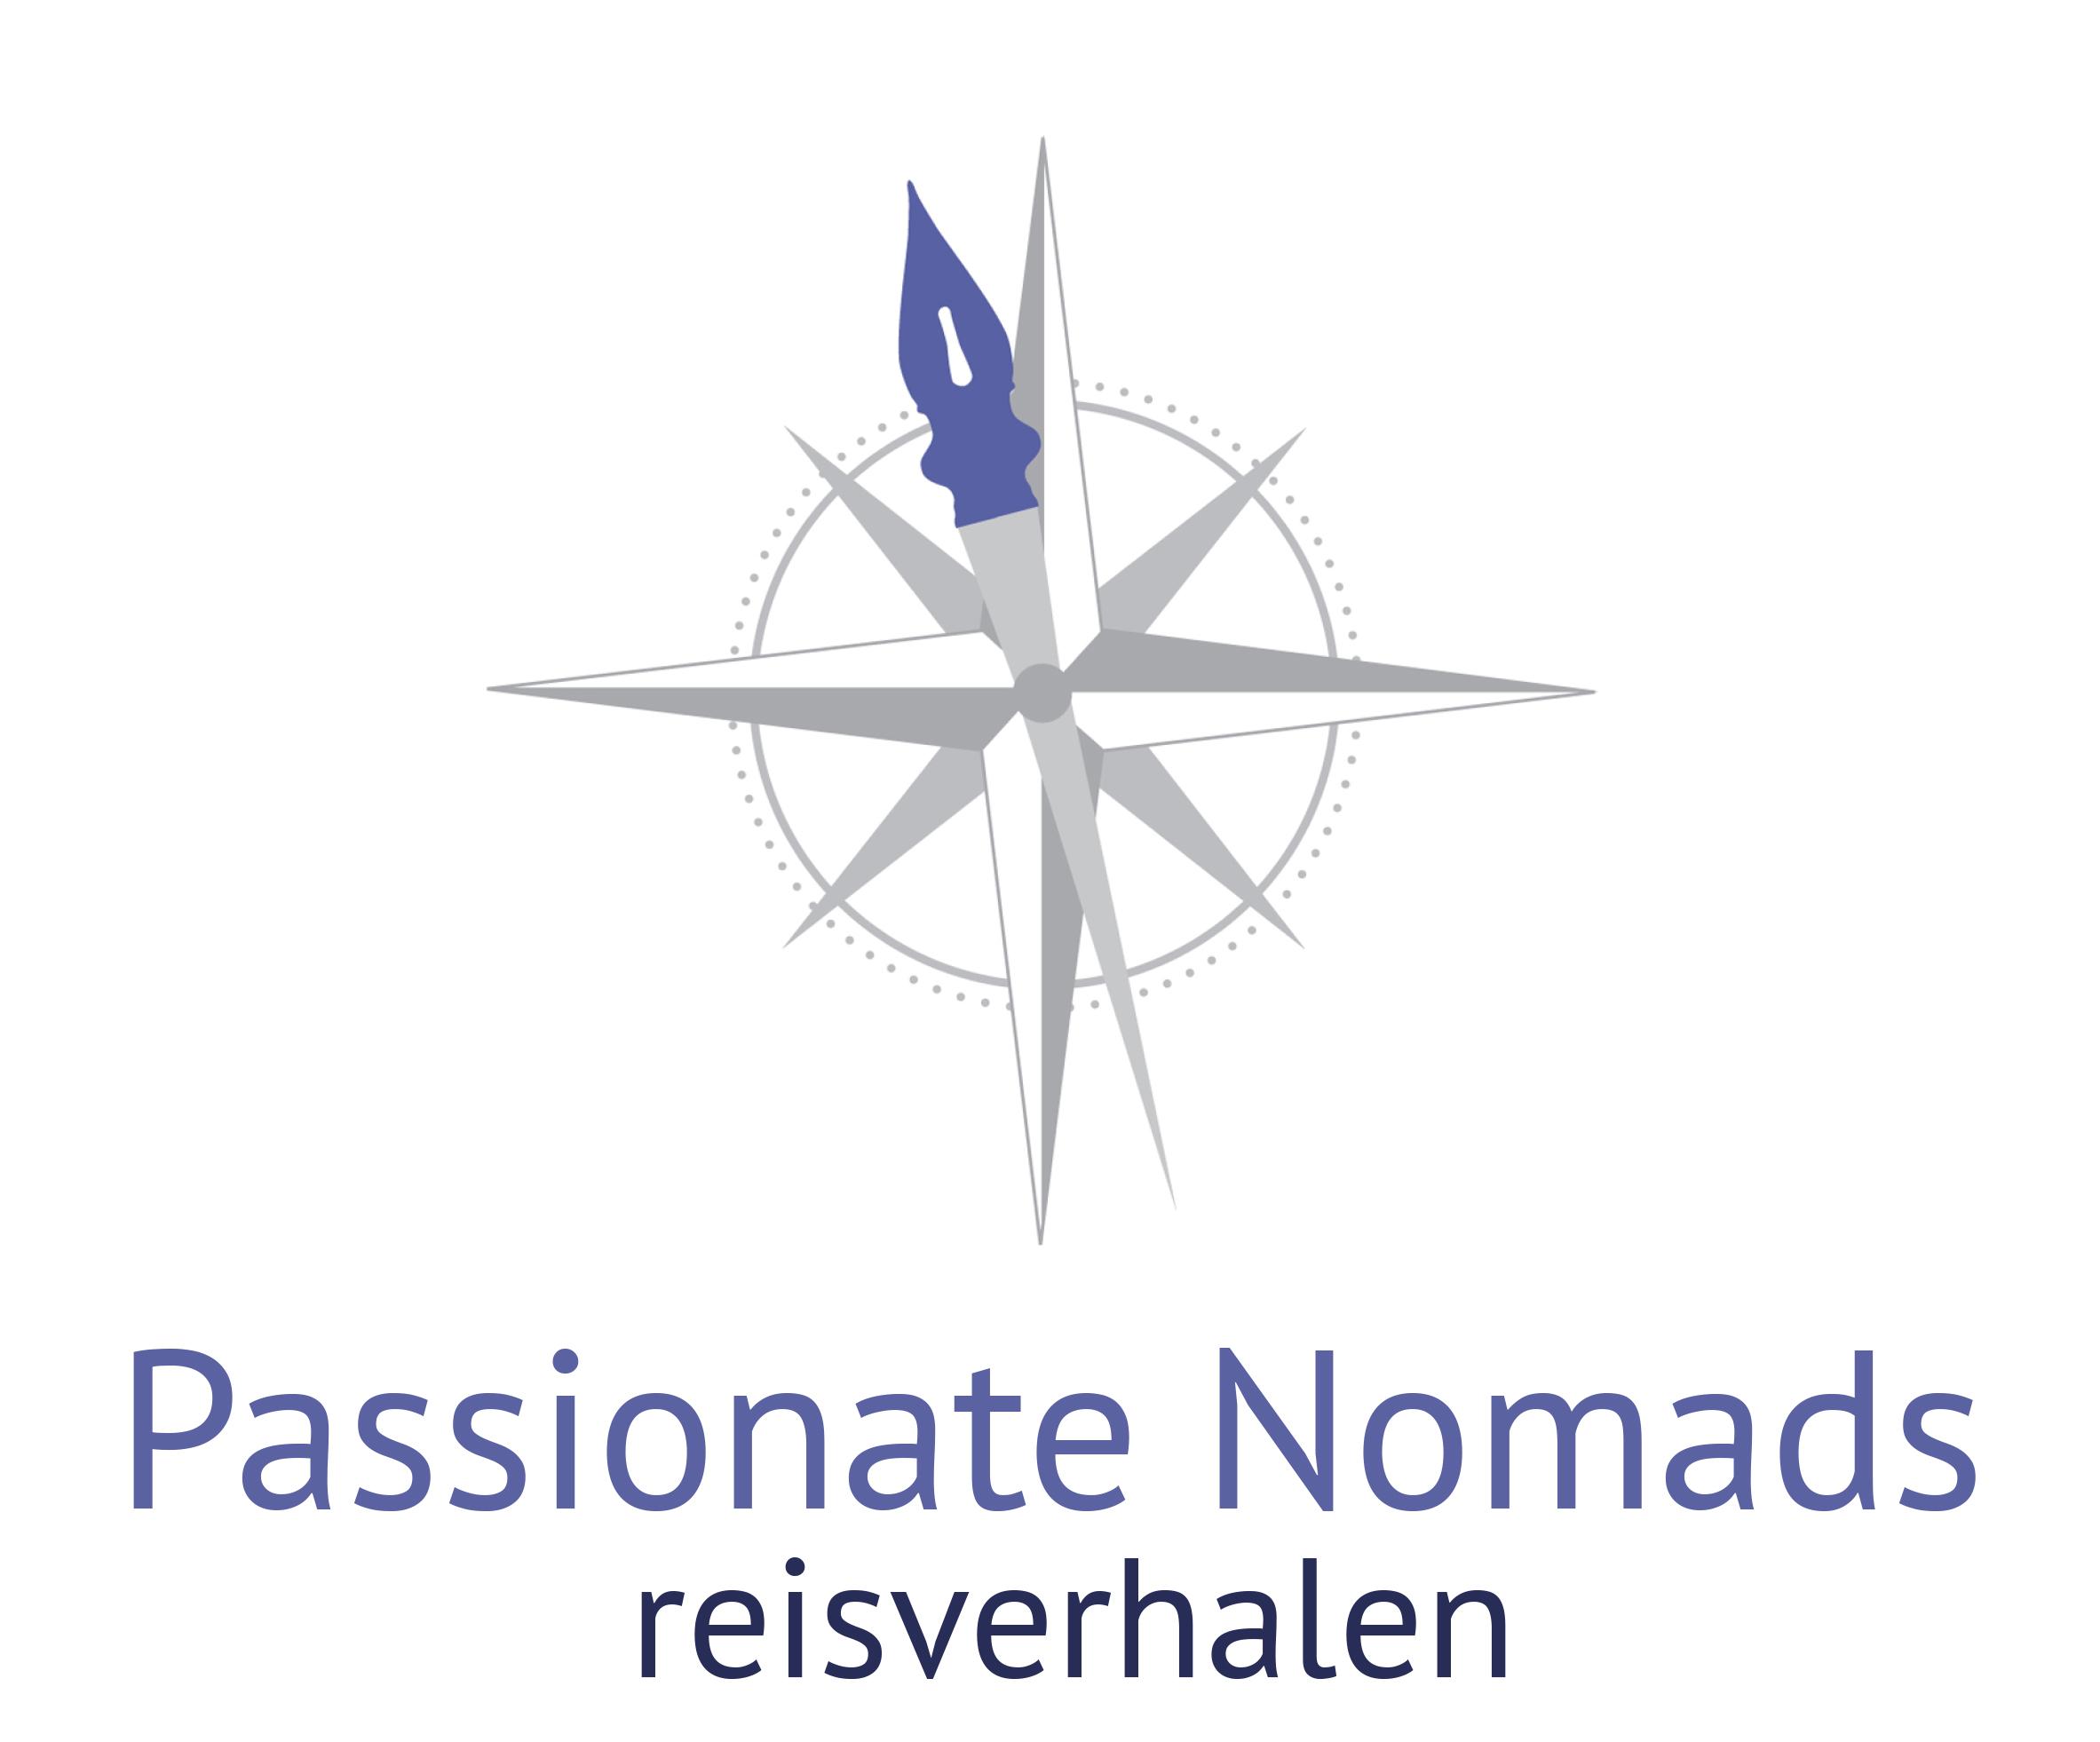 Passionate Nomads